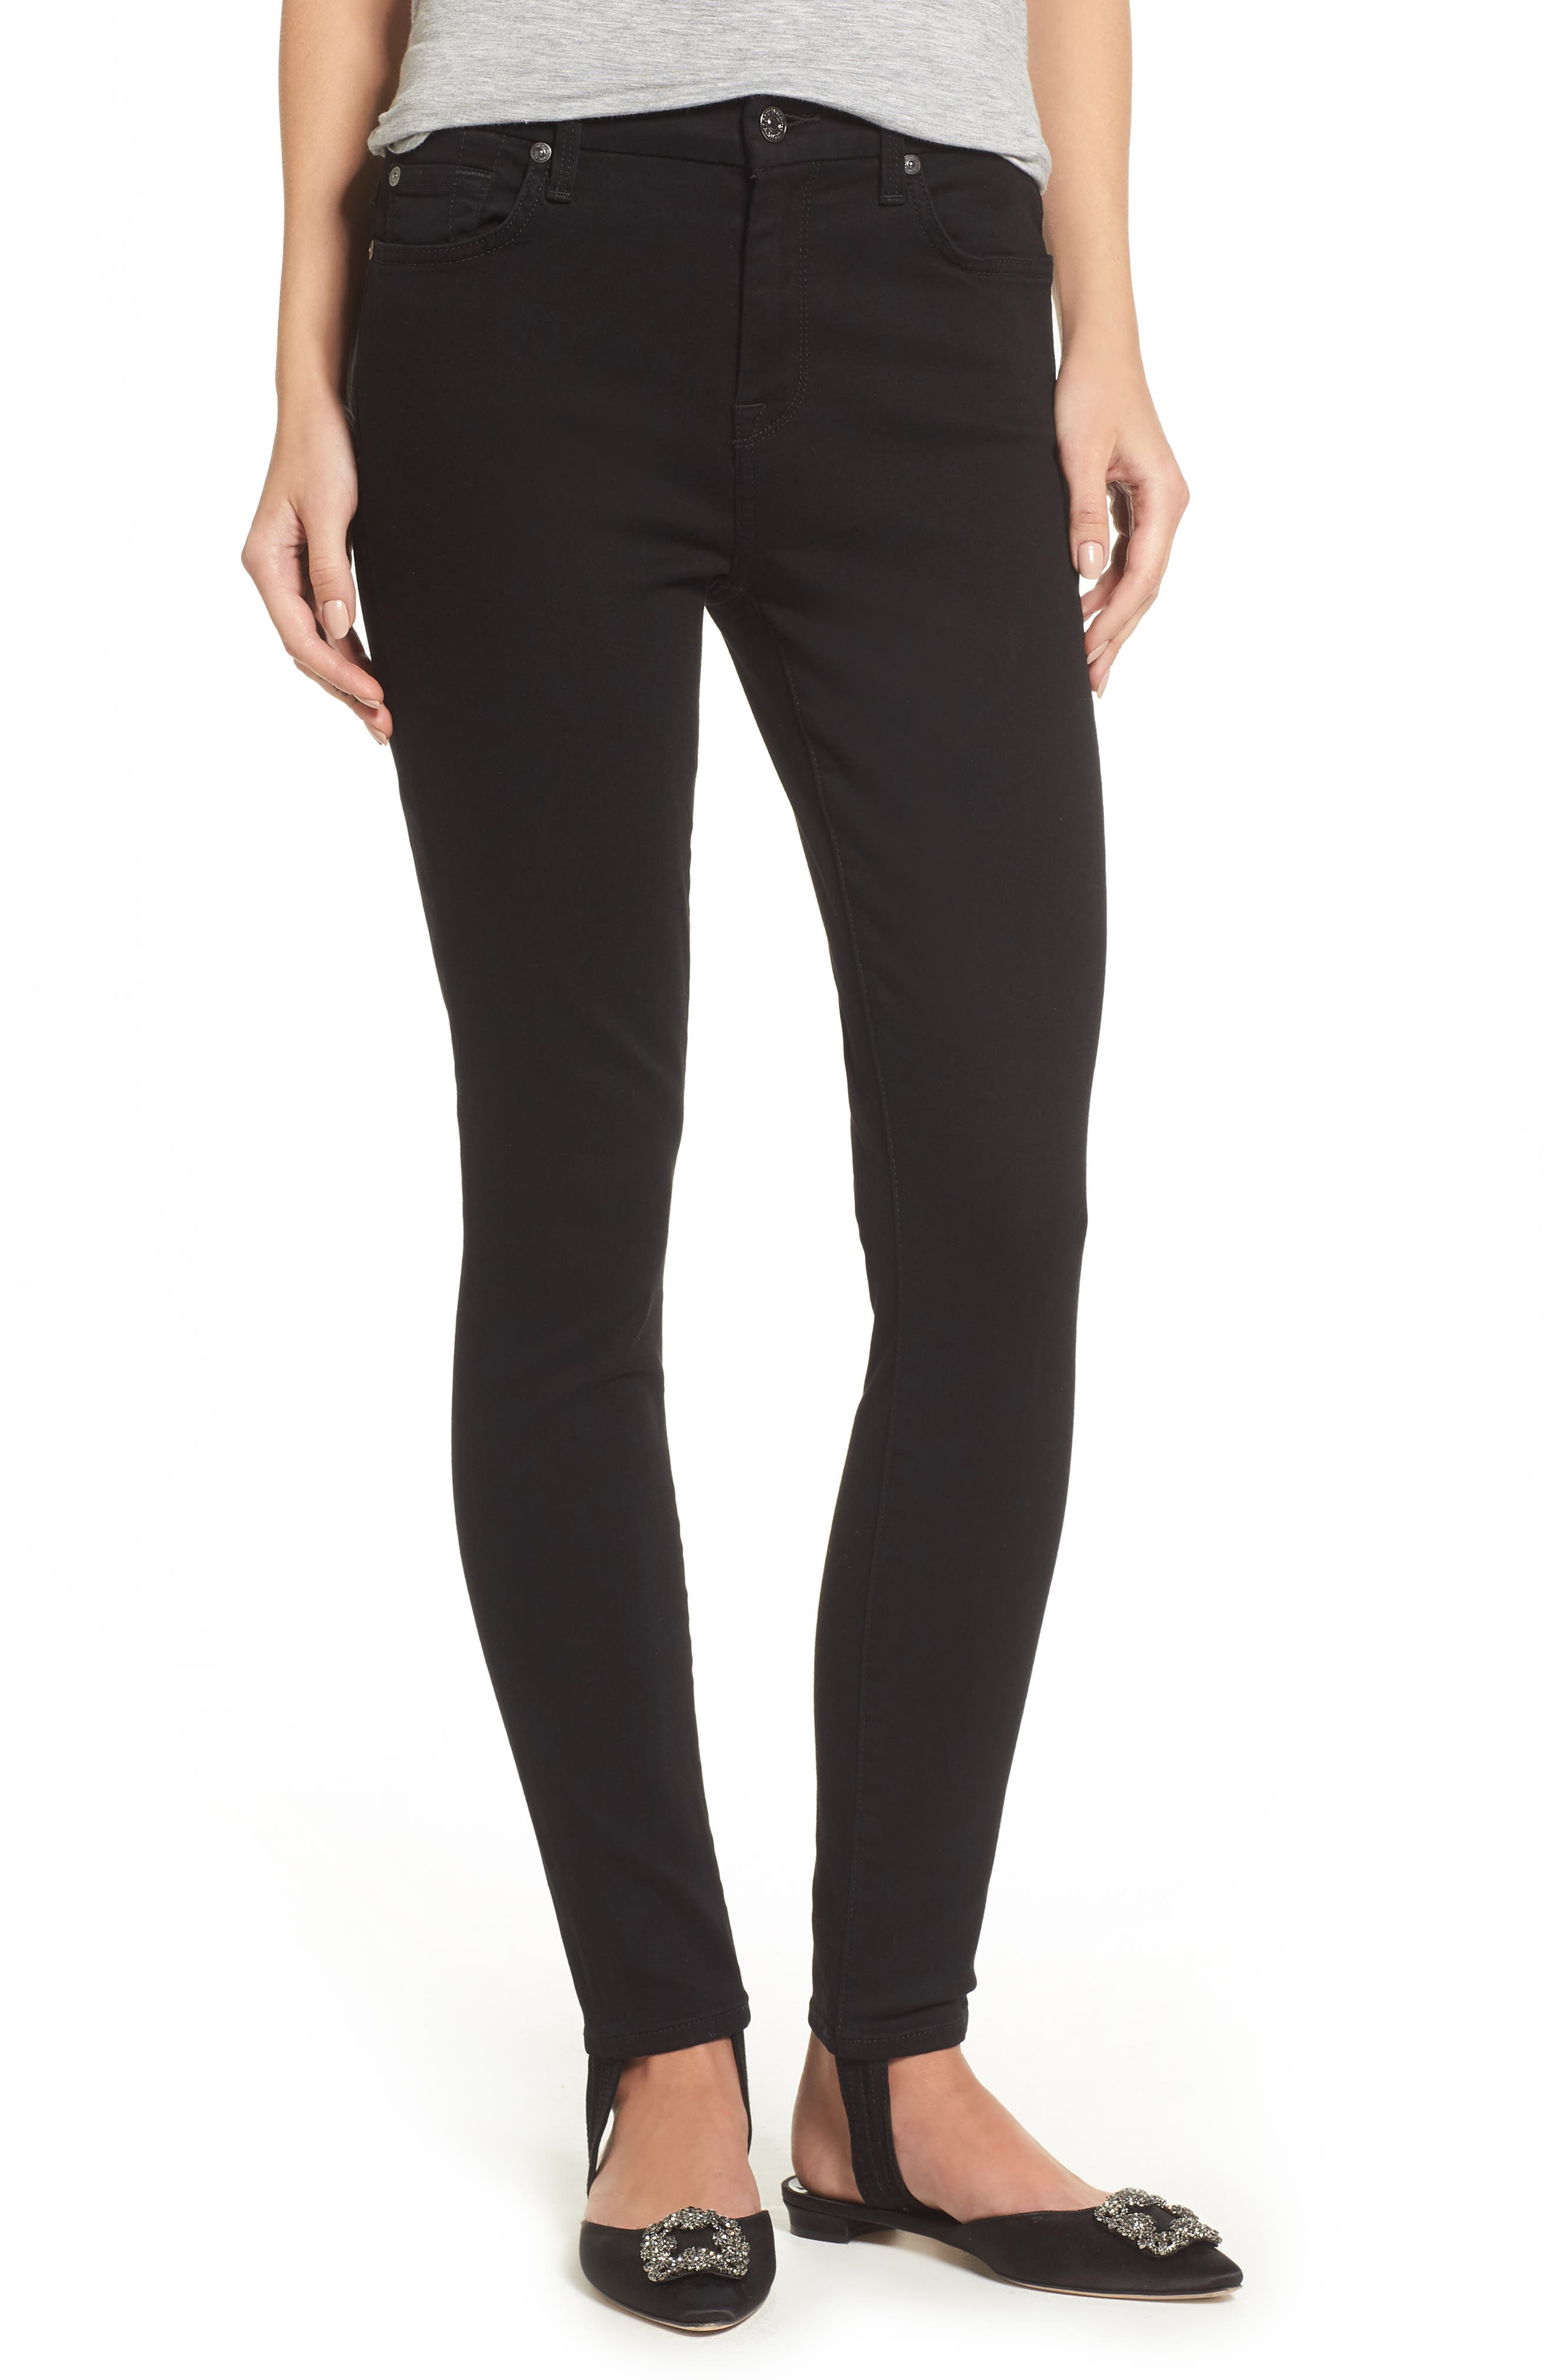 b(air) High Waist Ankle Skinny Stirrup Jeans,                             Main thumbnail 1, color,                             004